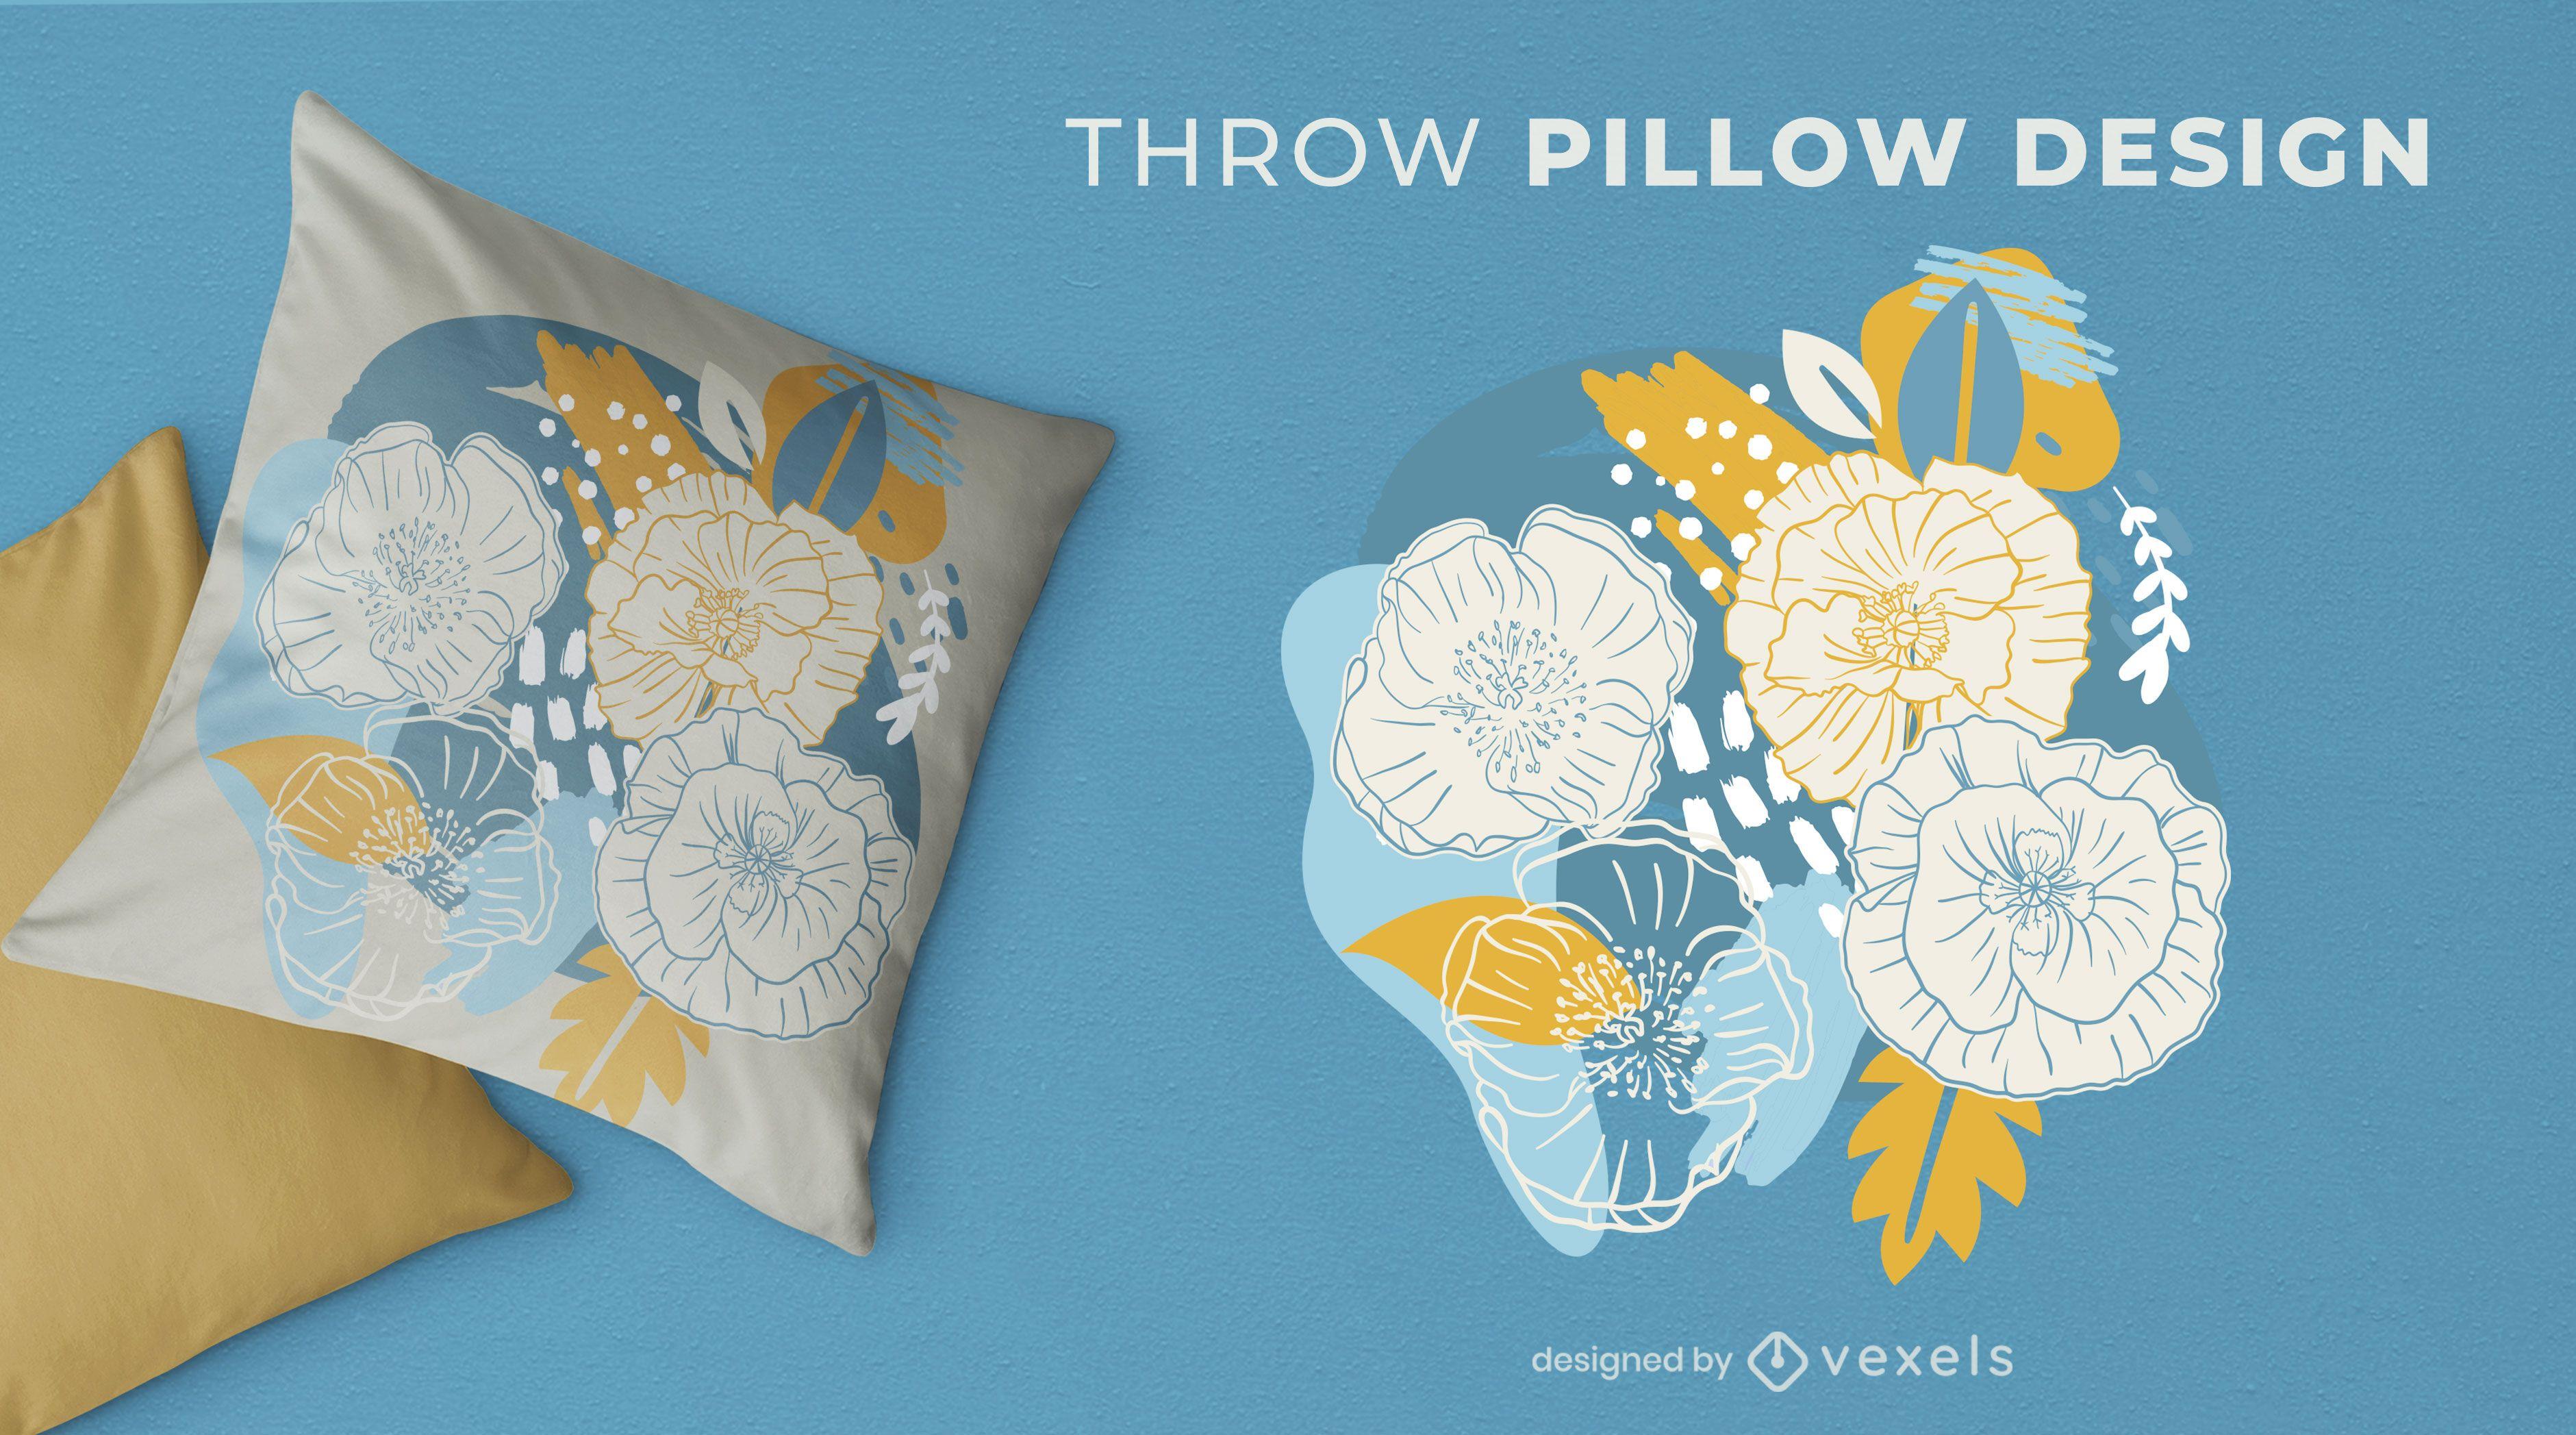 Abstract floral throw pillow design